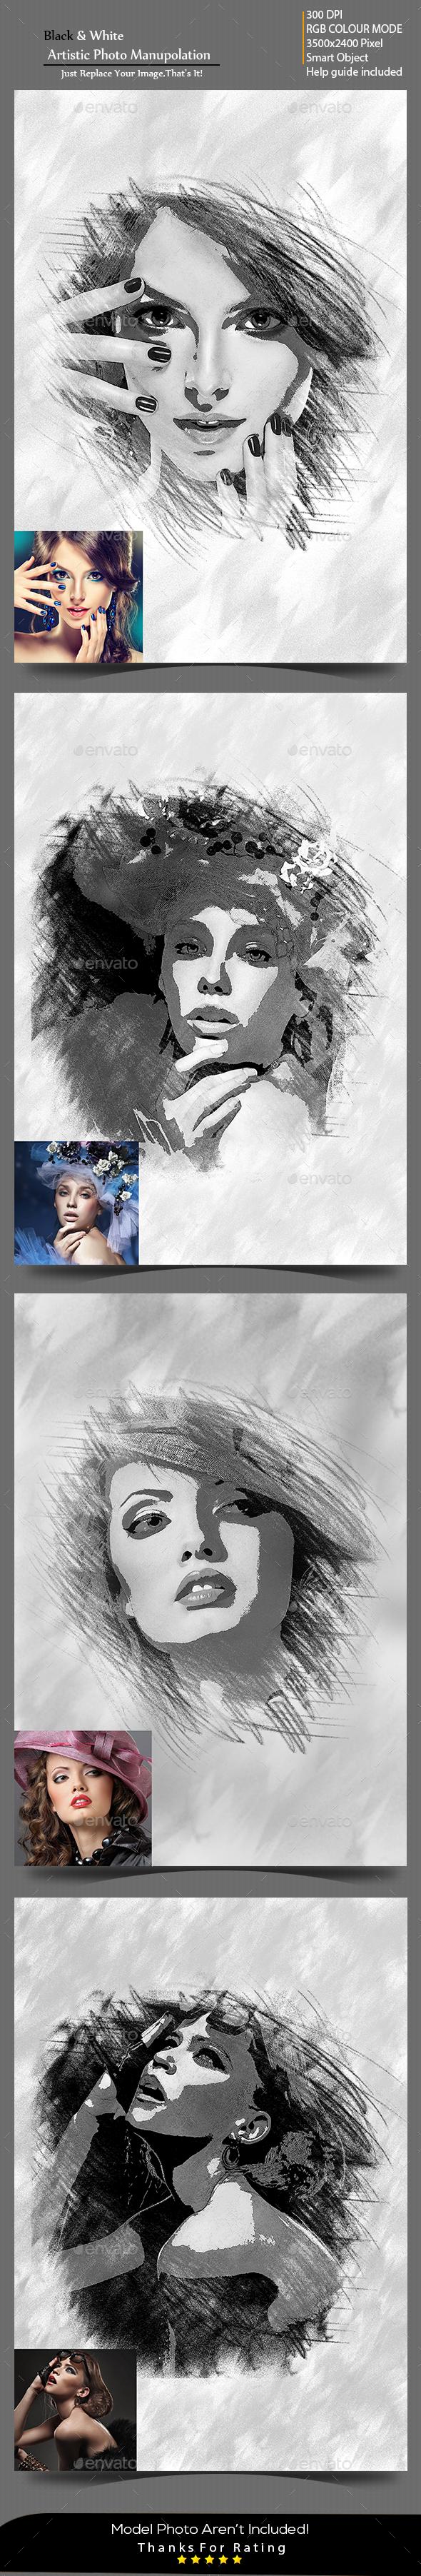 Black & White Artistic Photo Manuolation - Photo Templates Graphics